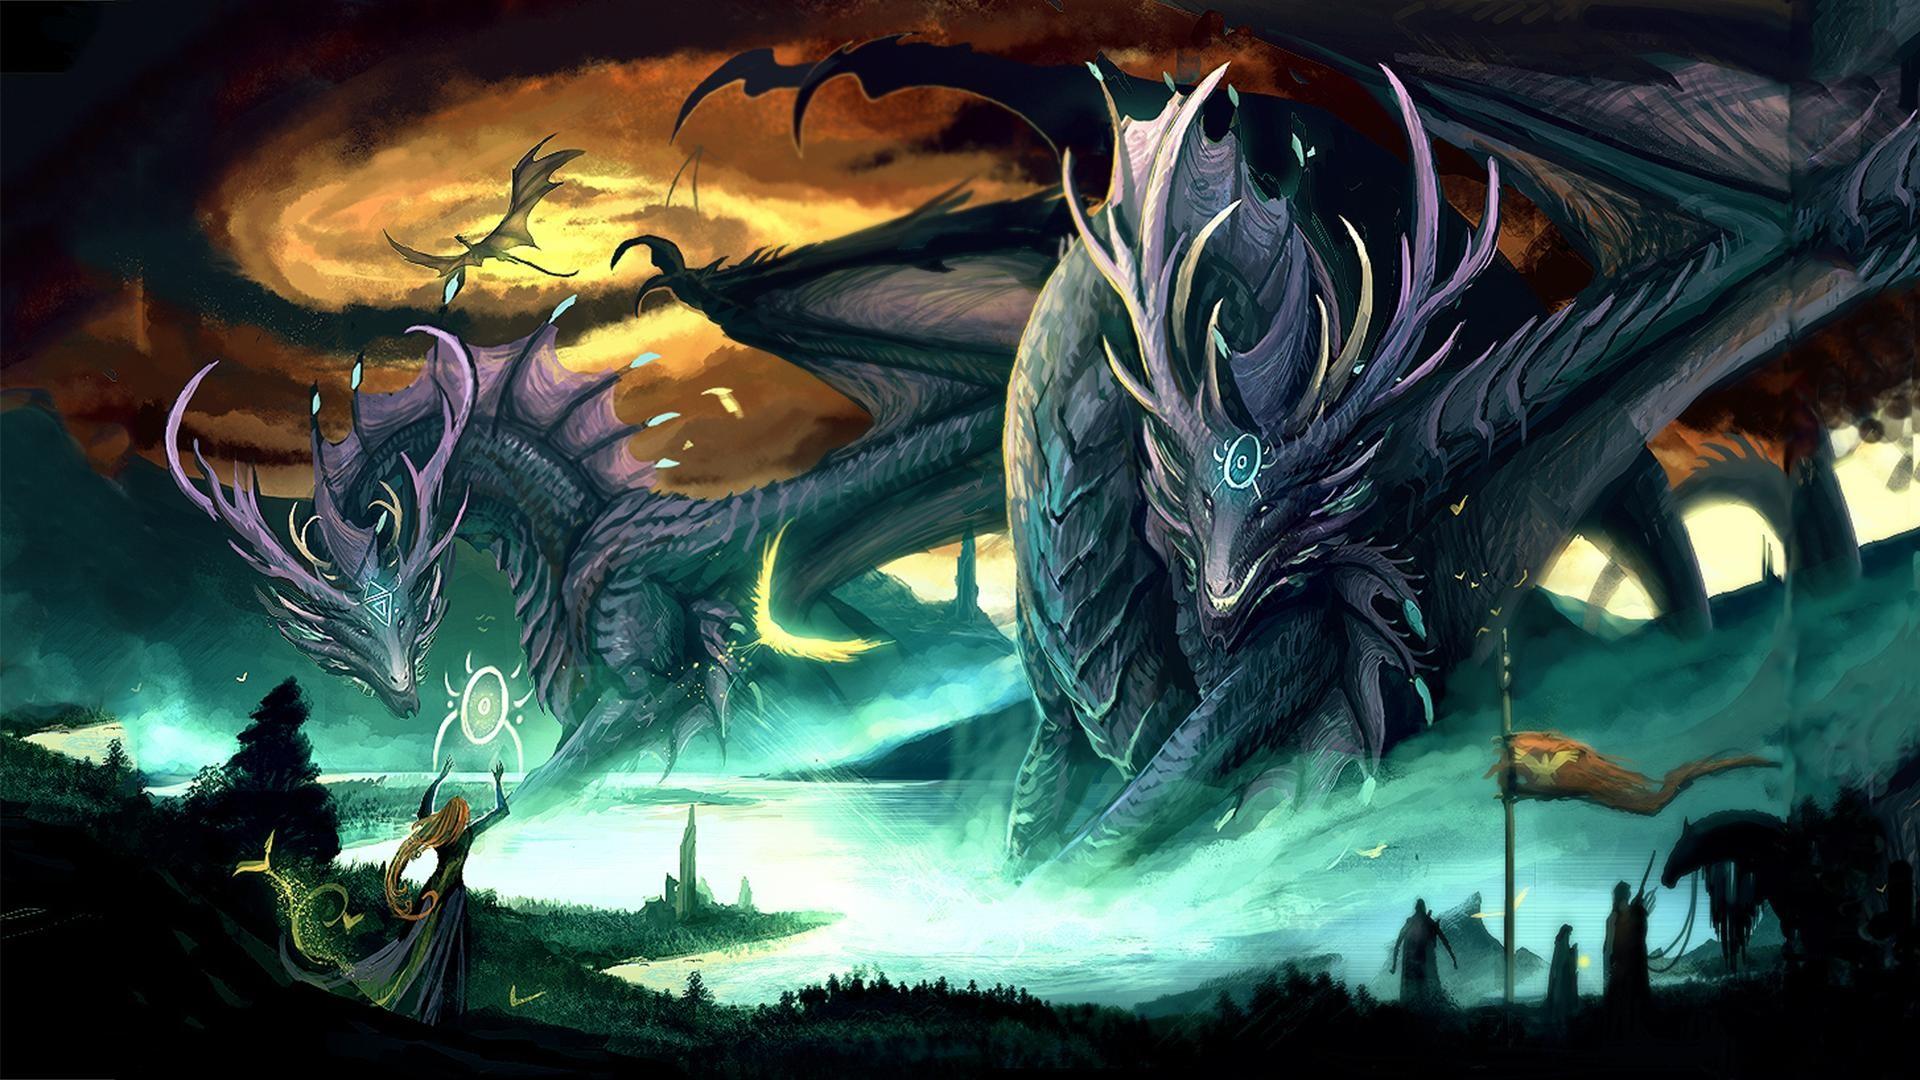 1920x1080 4096 Fantasy Dragon Wallpapers Page 6 Download Desktop